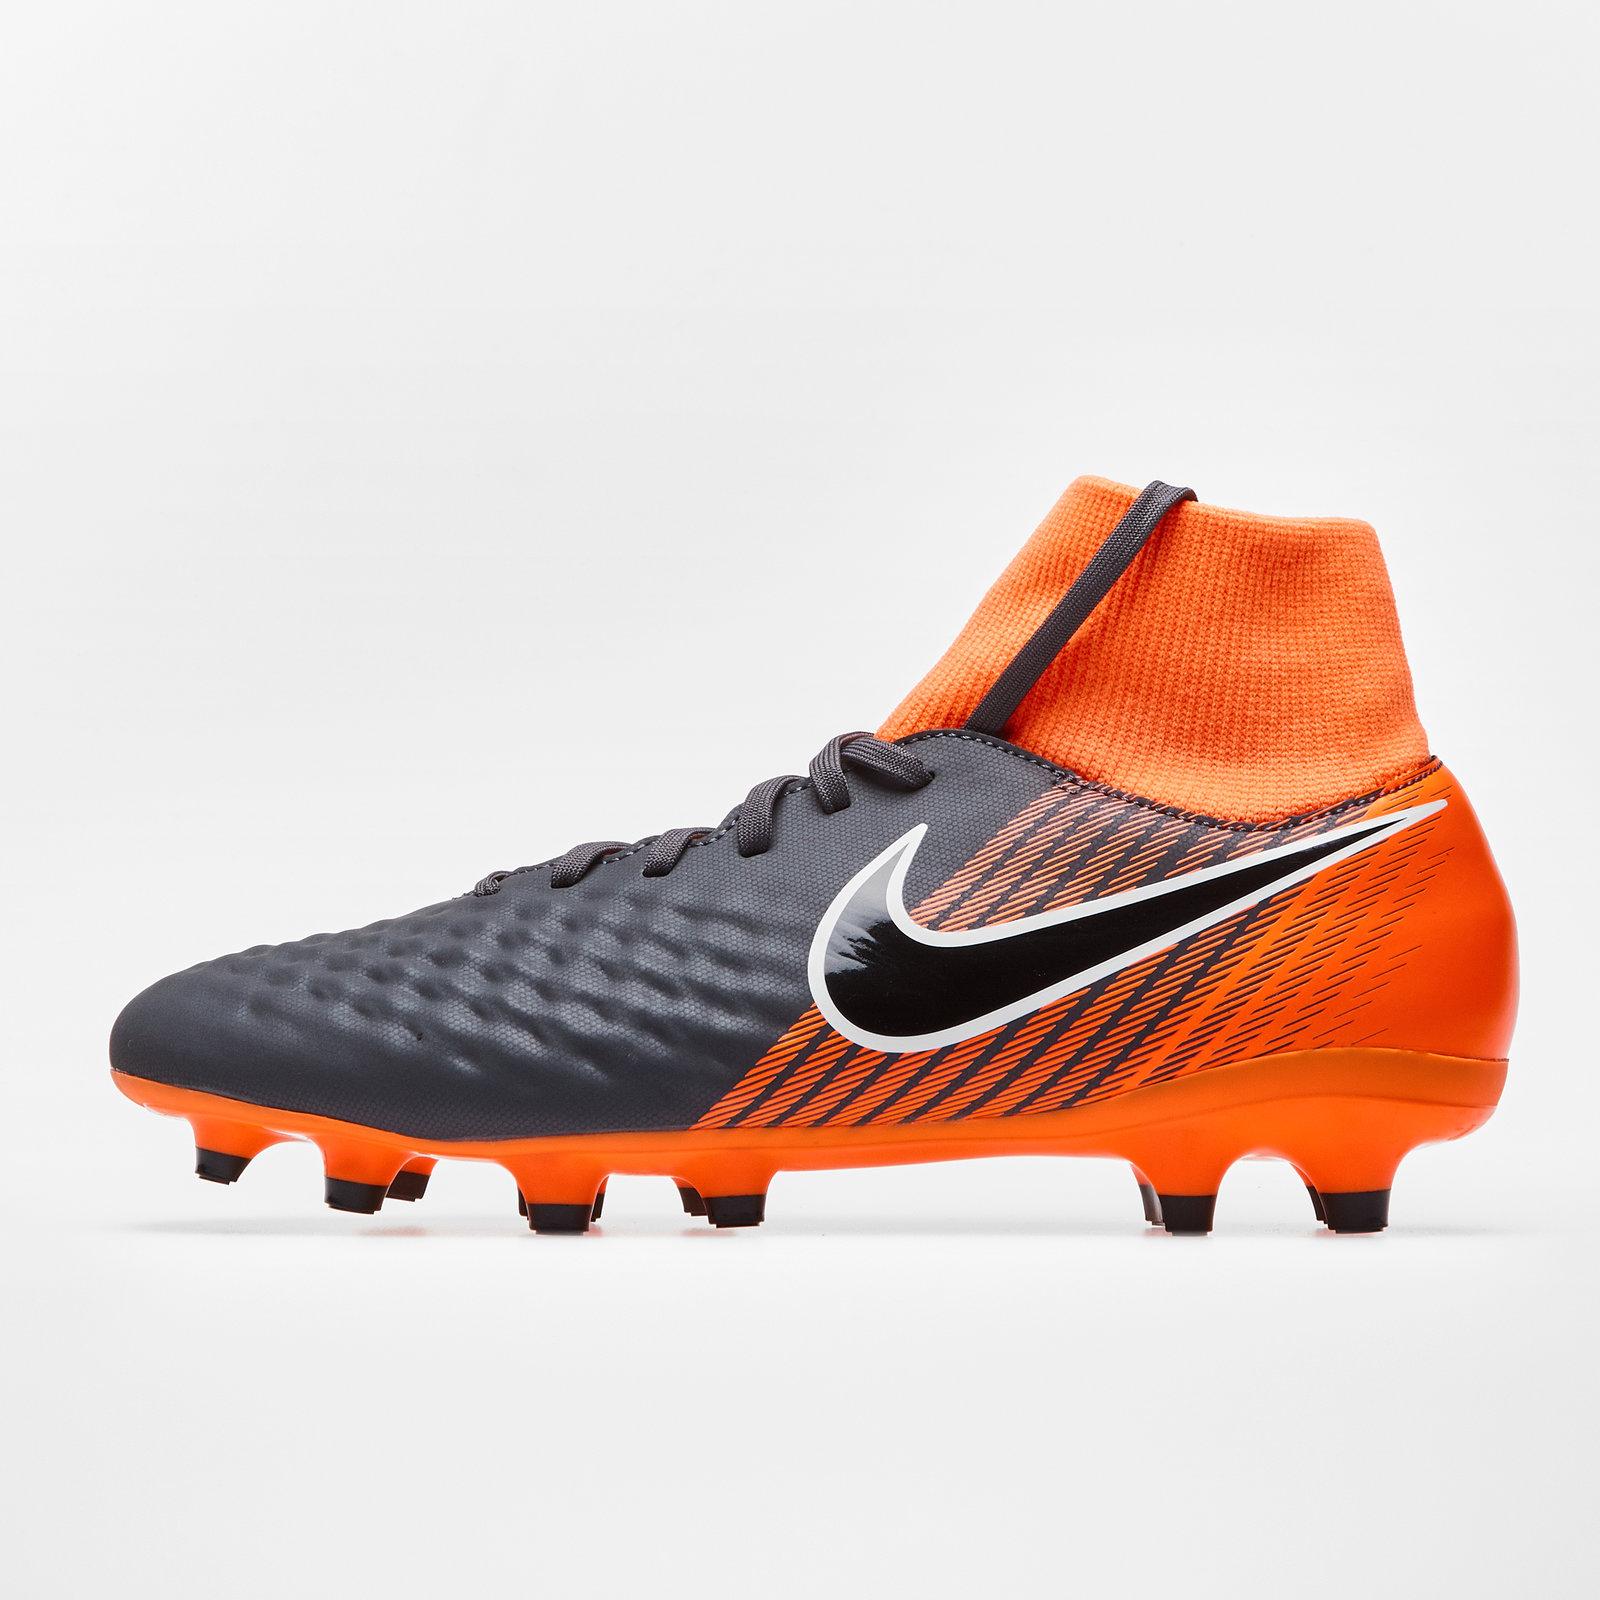 28c359180ed7 Nike Magista Football Boots | Nike Magista Onda | Compare Cheap Deals